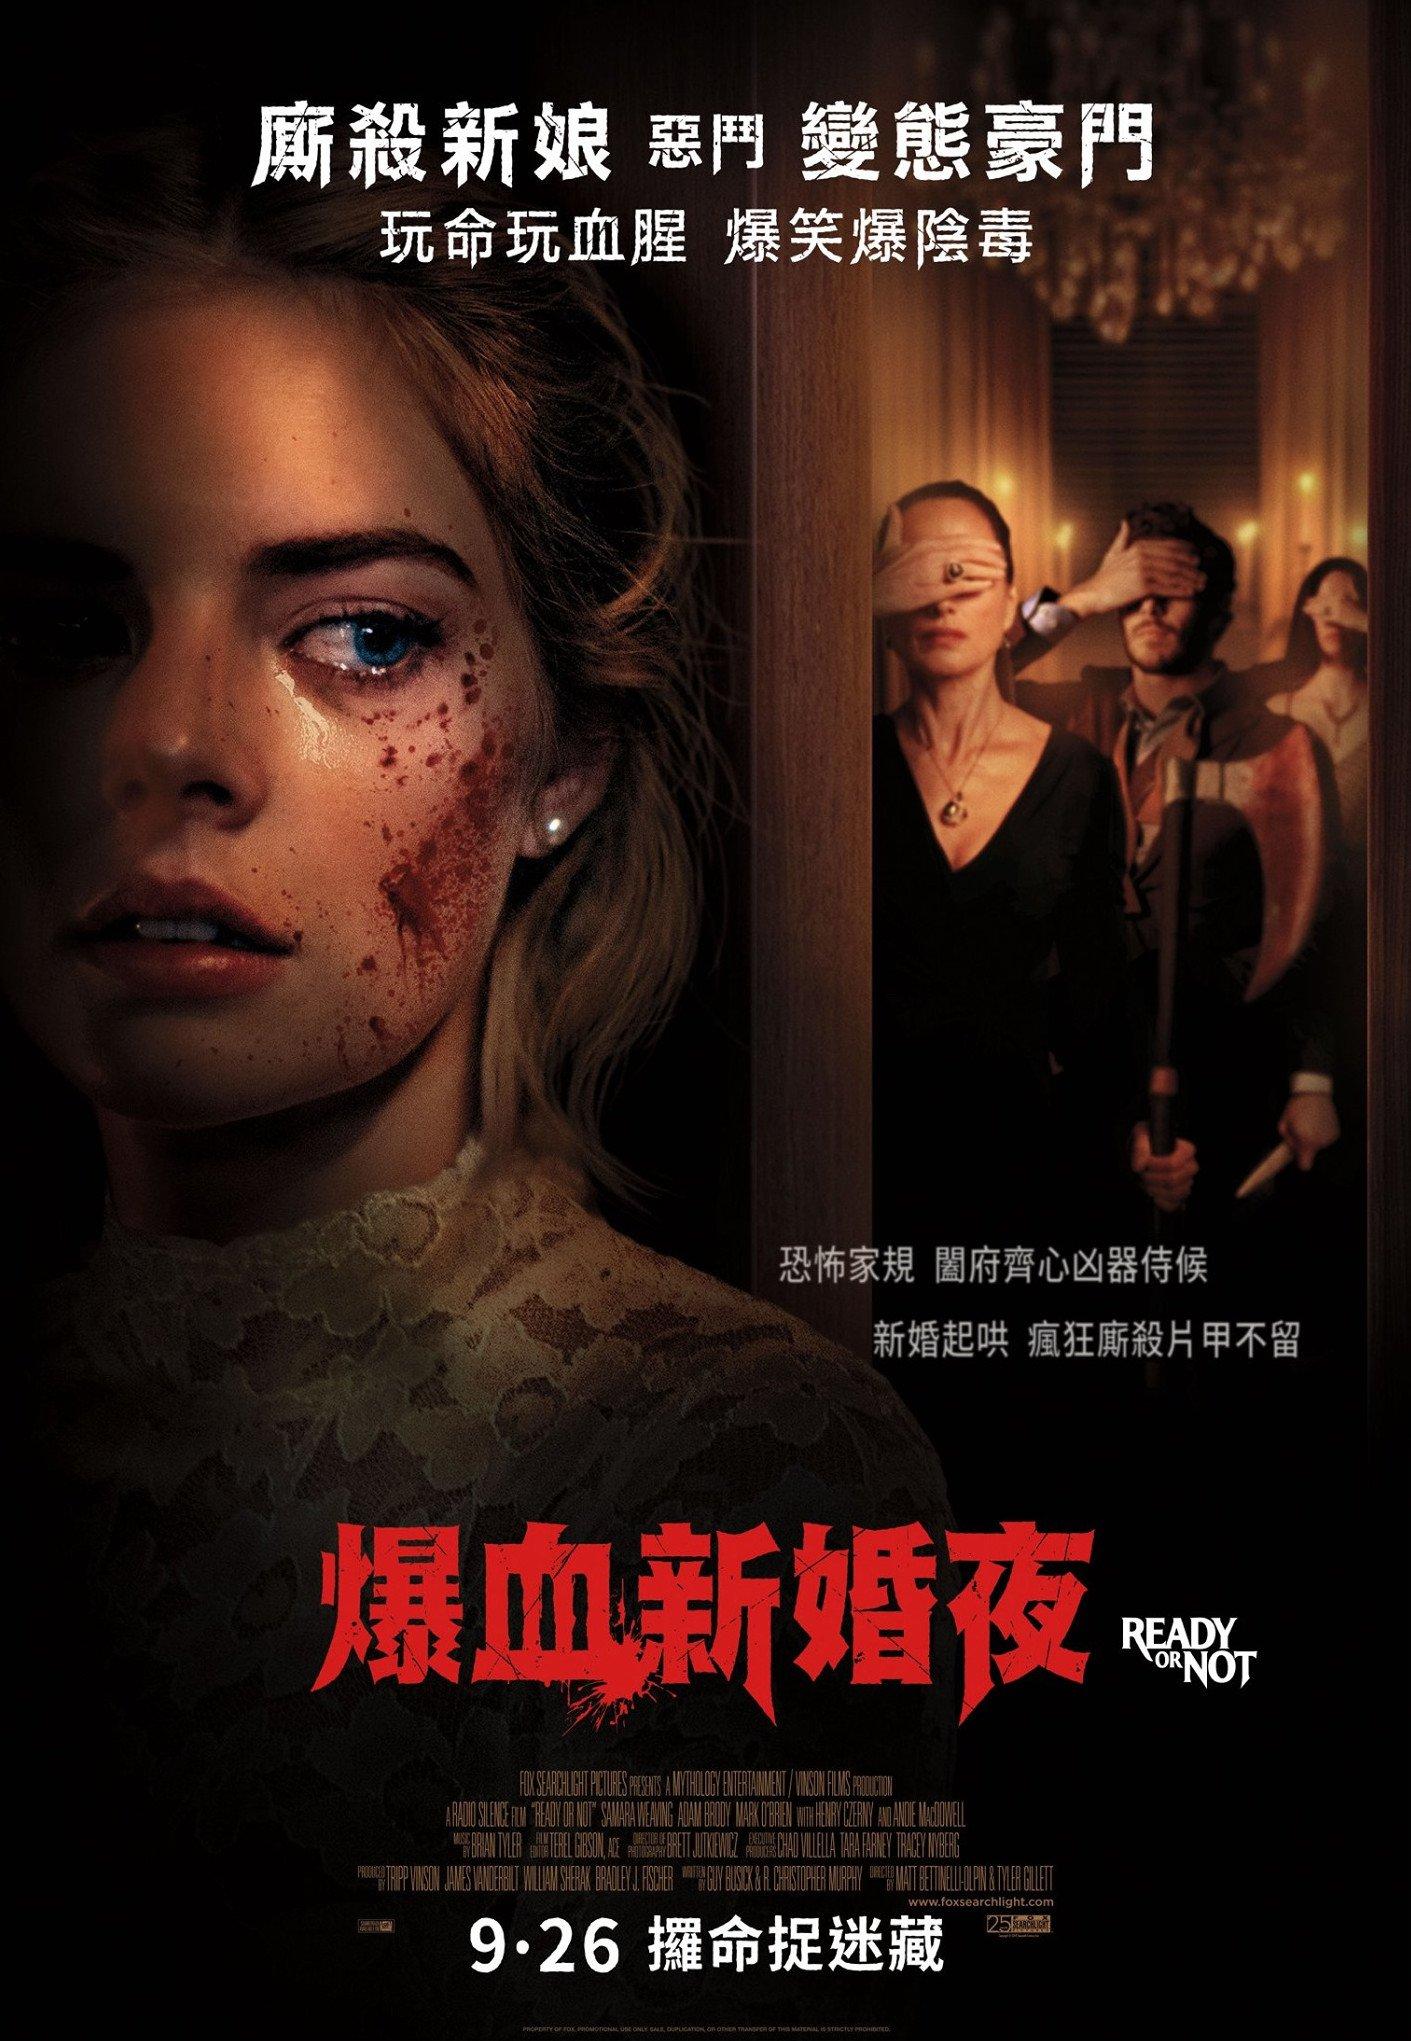 RON International China Poster 1.jpg